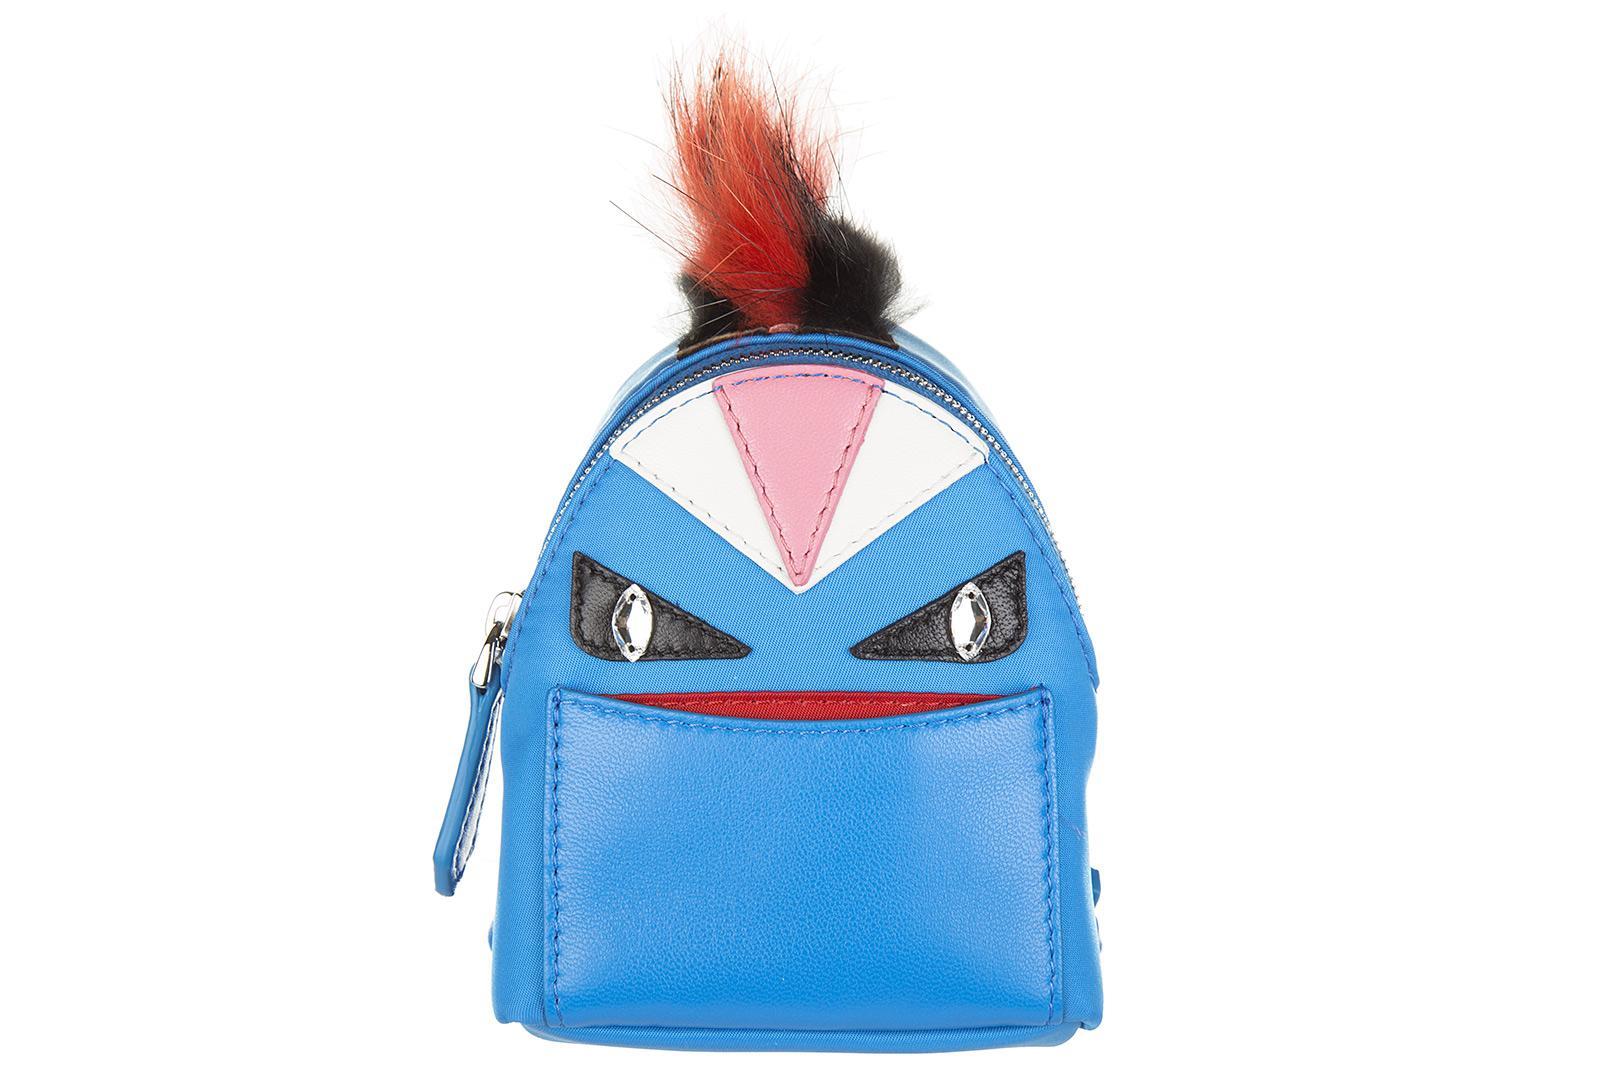 2064660f9db4 Fendi Women. FENDI. Women s Bag Charm Bag Bugs ...